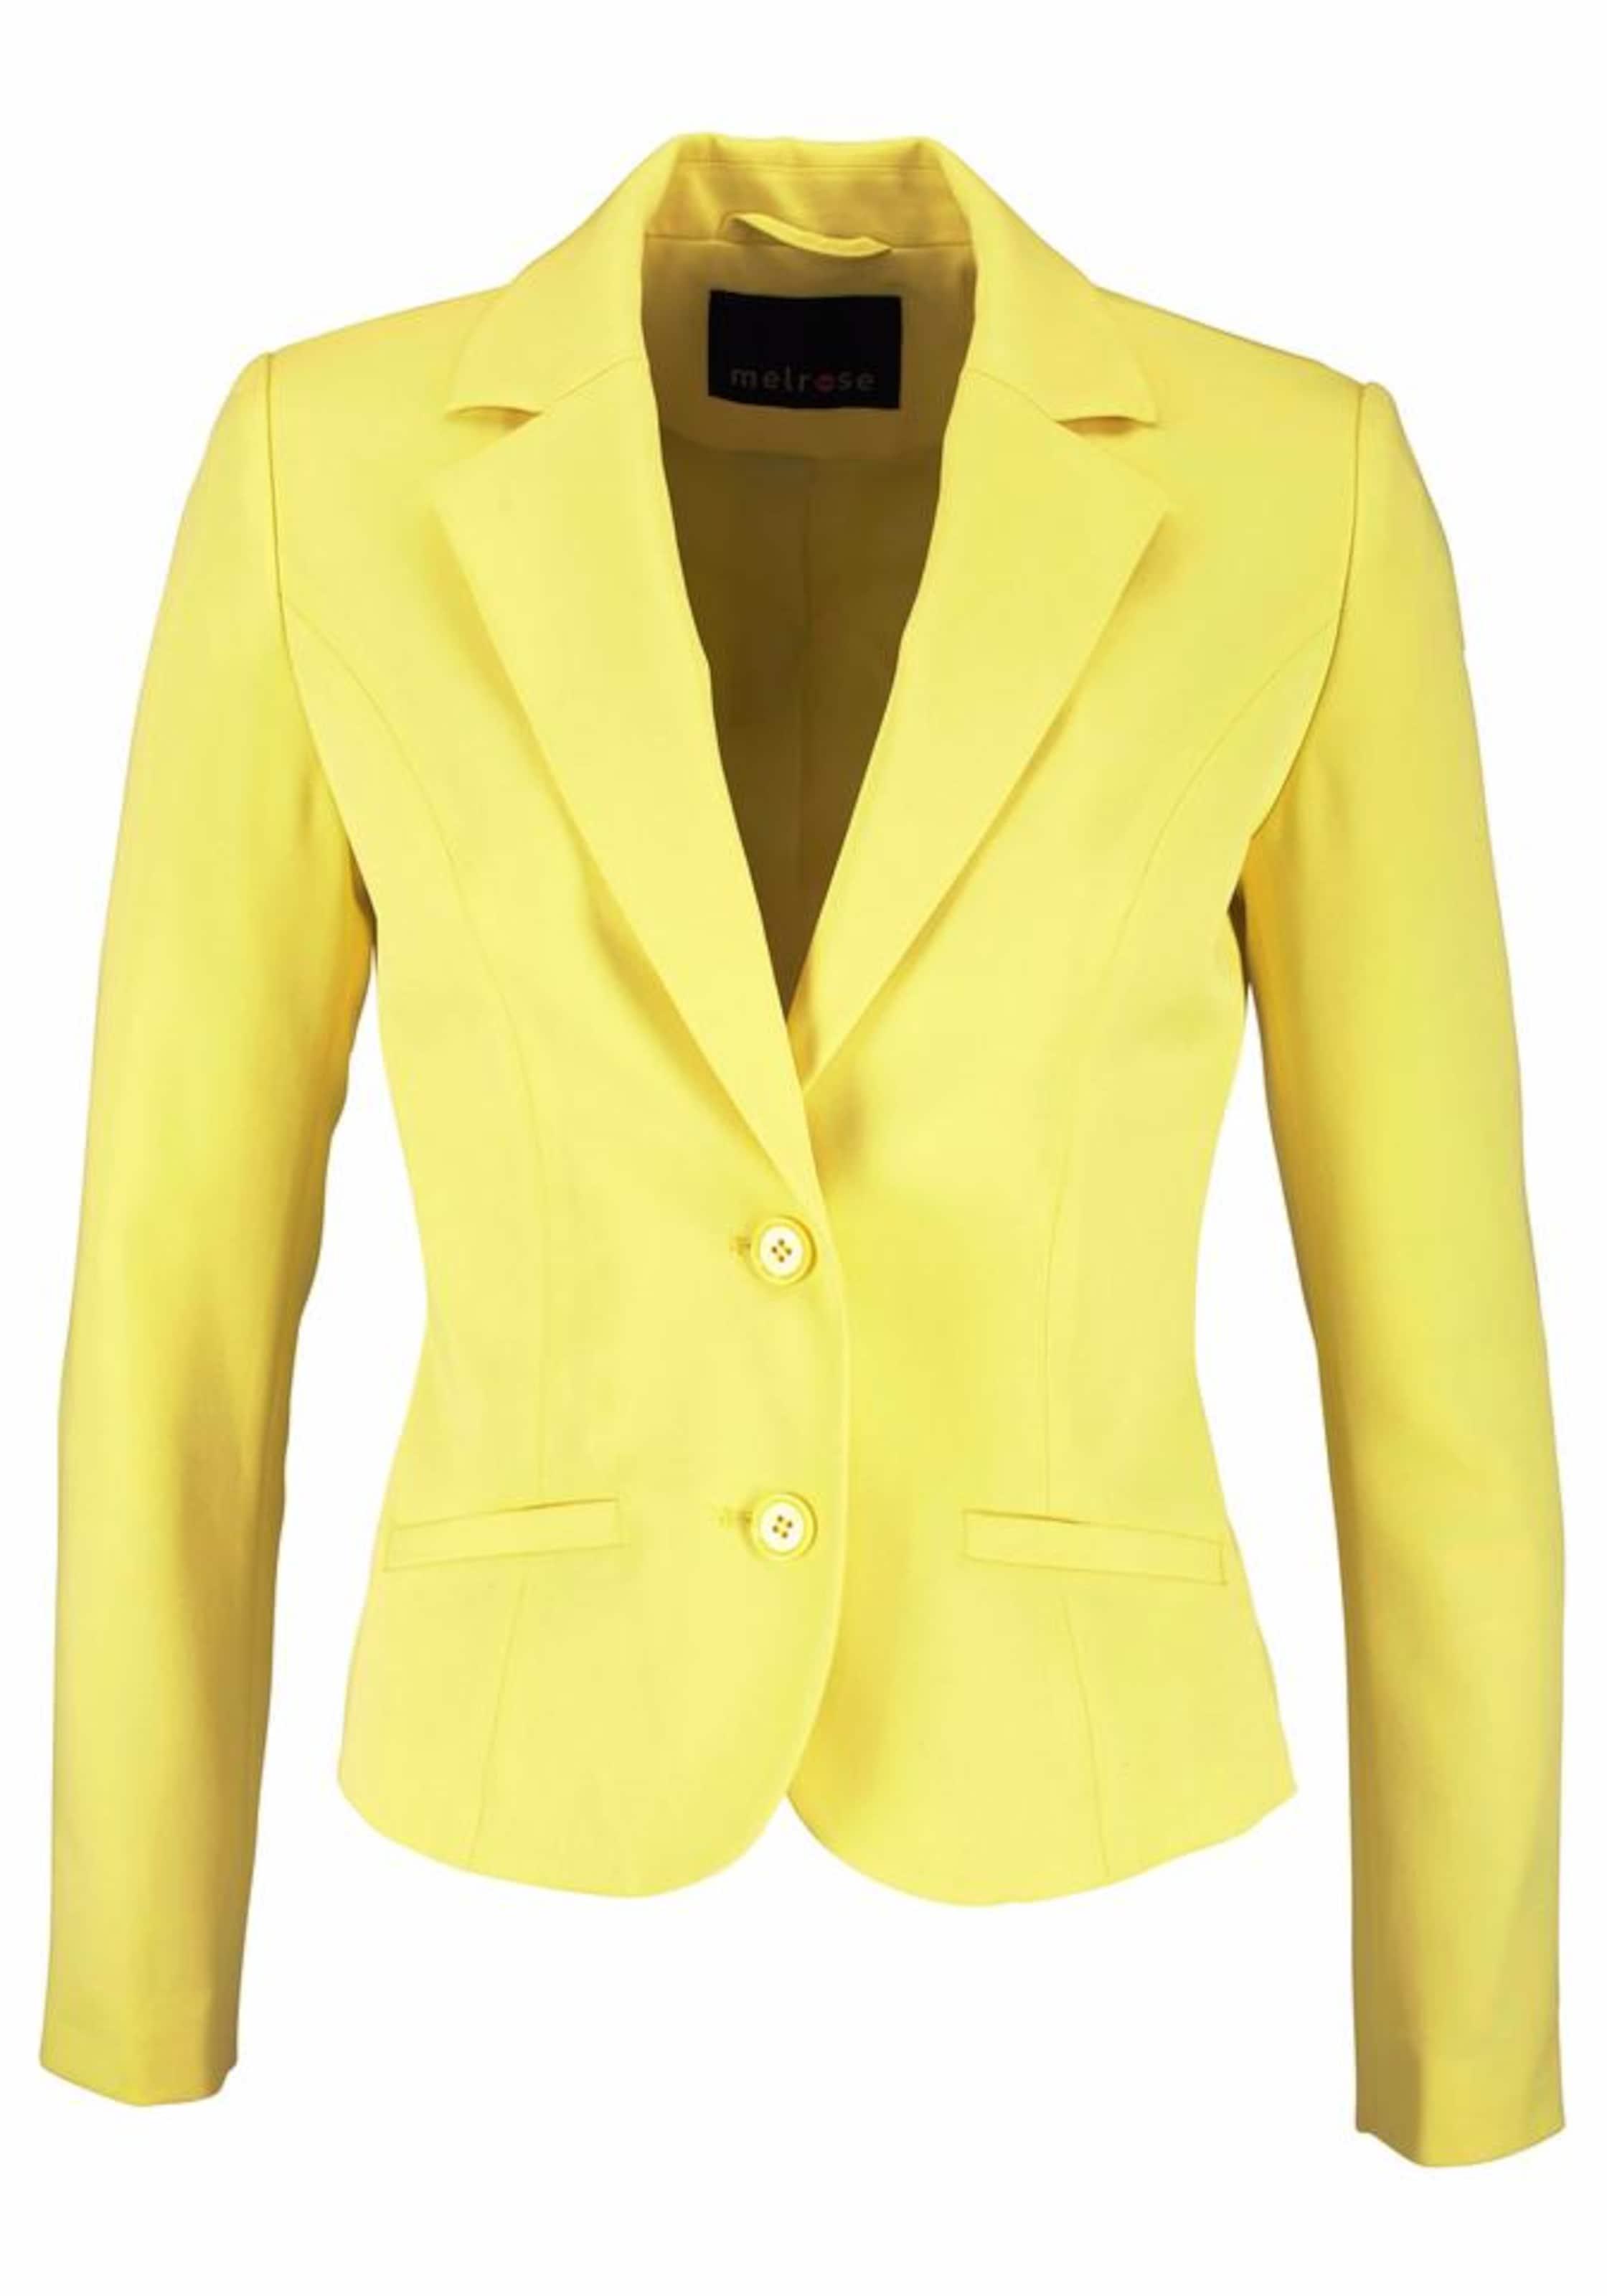 Melrose Melrose In In Gelb Gelb Blazer Blazer 8O0vwmNn